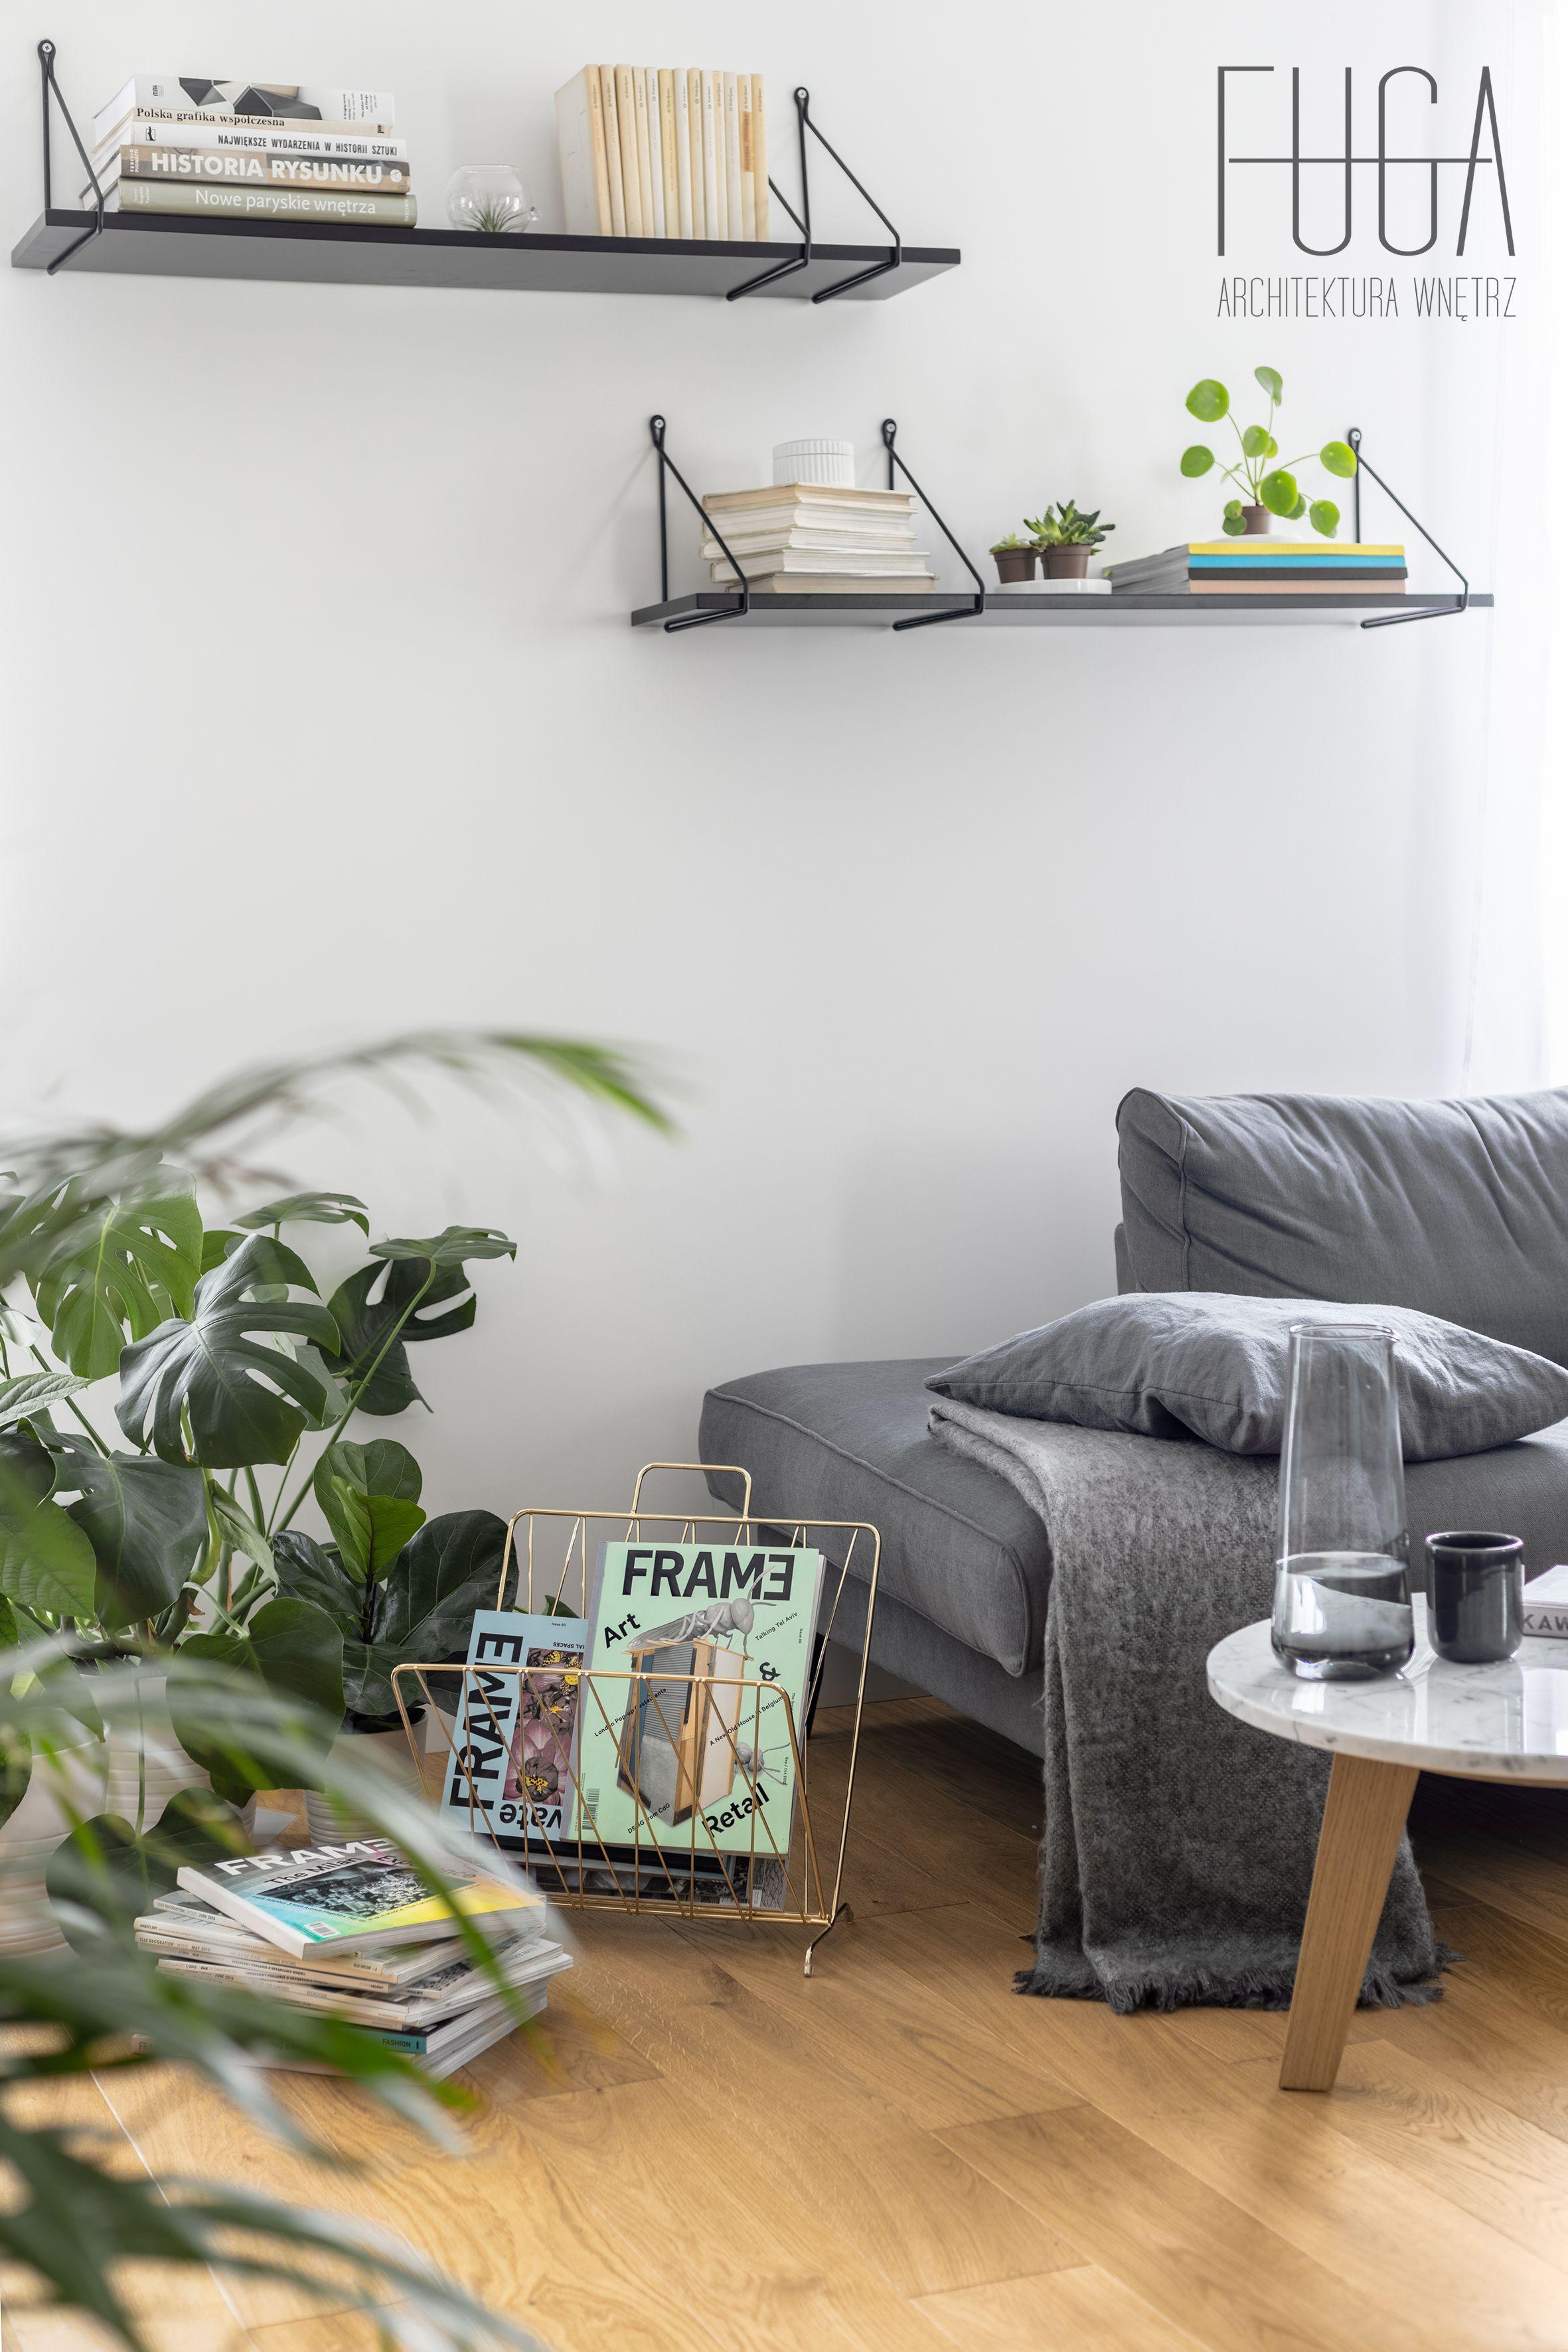 Living room in Warsaw #livingroom #livingroomideas #greysofa #comfortablesofa #sofaideas #woodenfloor #lamps #coffeetable #coffeetableideas #interiordesign #designideas #minimallivingroom #whiteinterior #decorideas #designflatideas #designideas #lovelyplace #bookshelf #bookshelfideas #whitewall #minimalinteriors #blackandwhite #pillows #flower #interiorwithflower